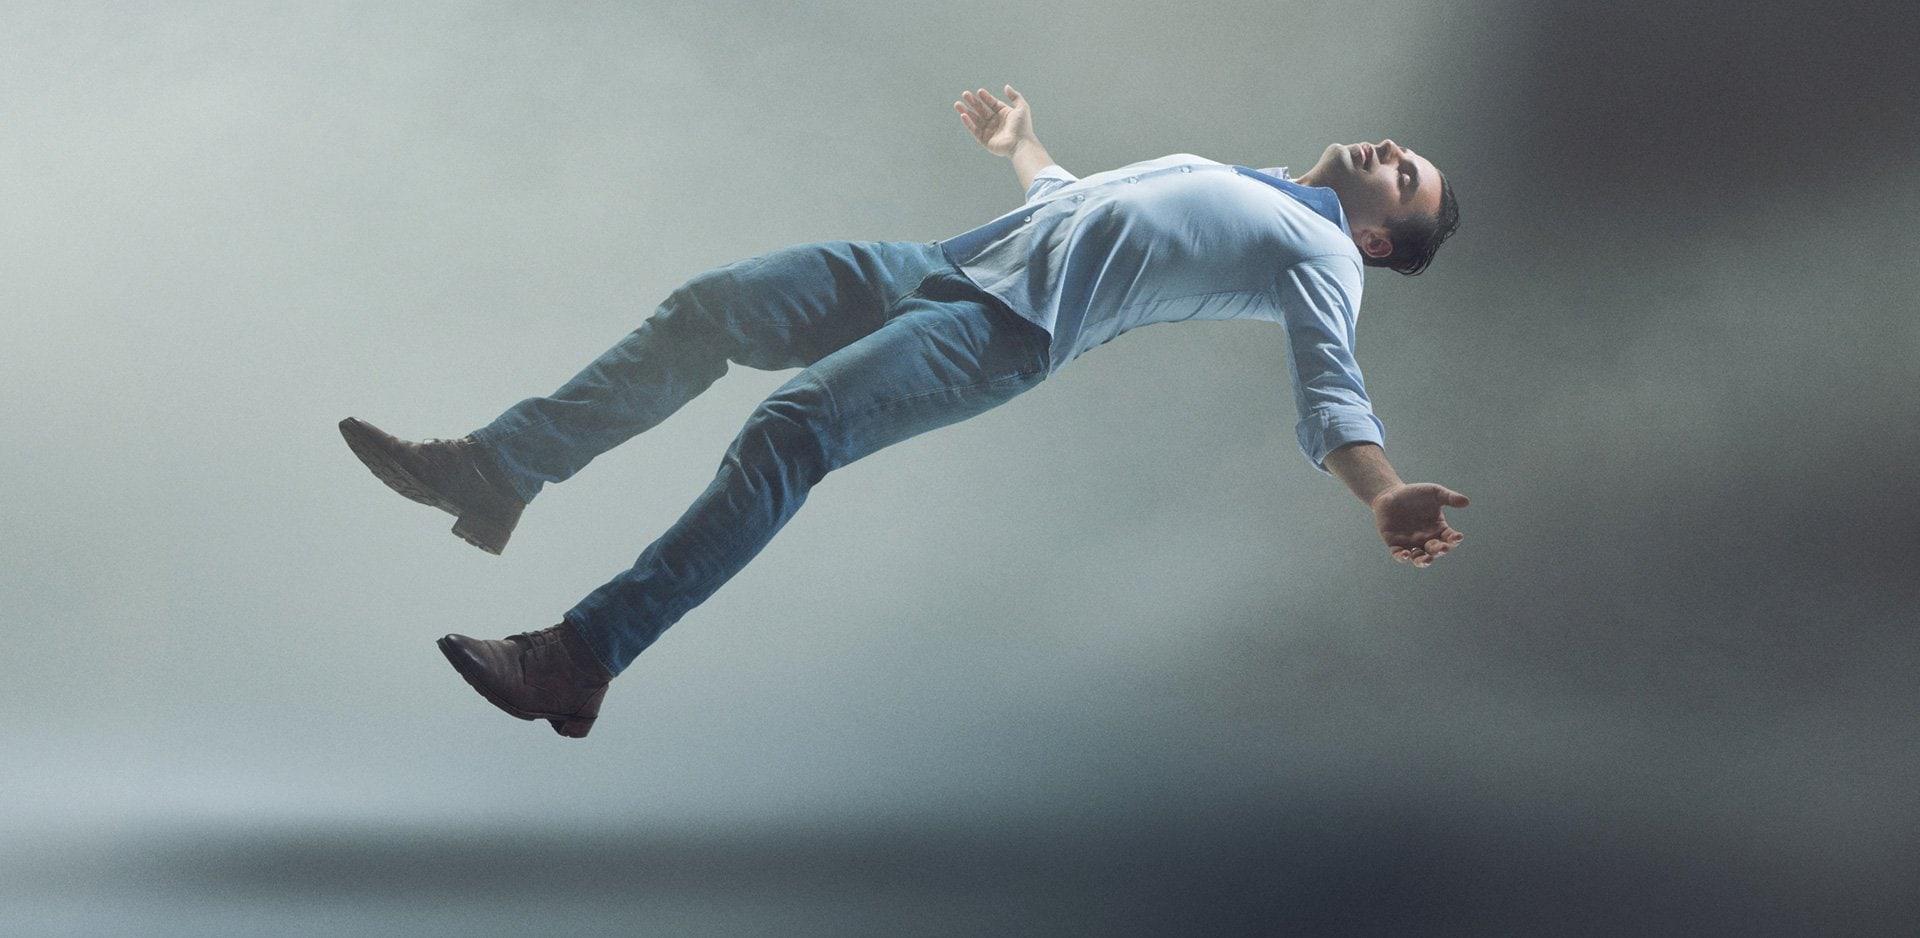 dreaming of falling